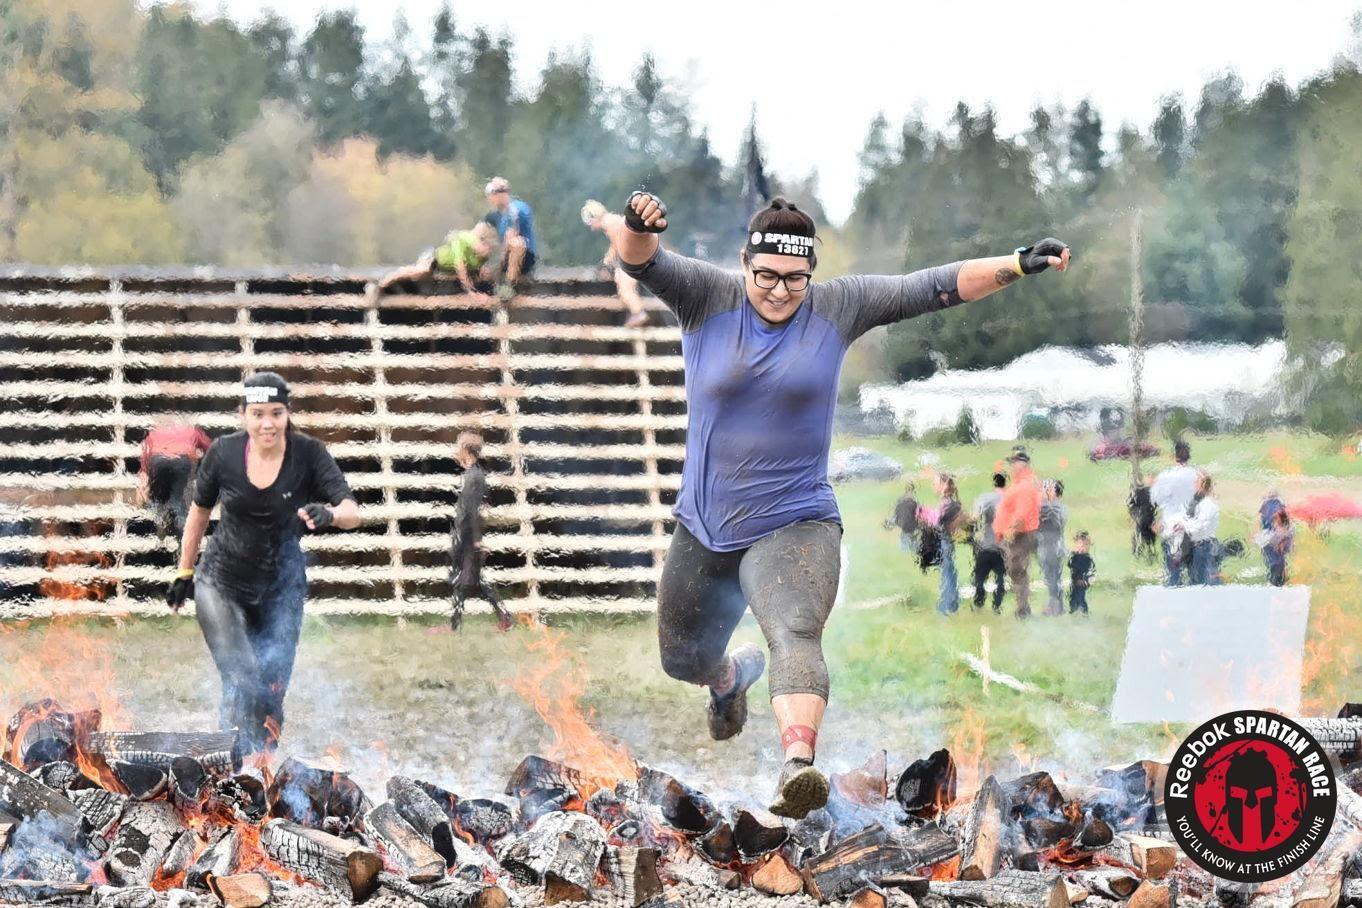 Seattle Spartan Sprint, 2016. Photo Credit: Spartan Race